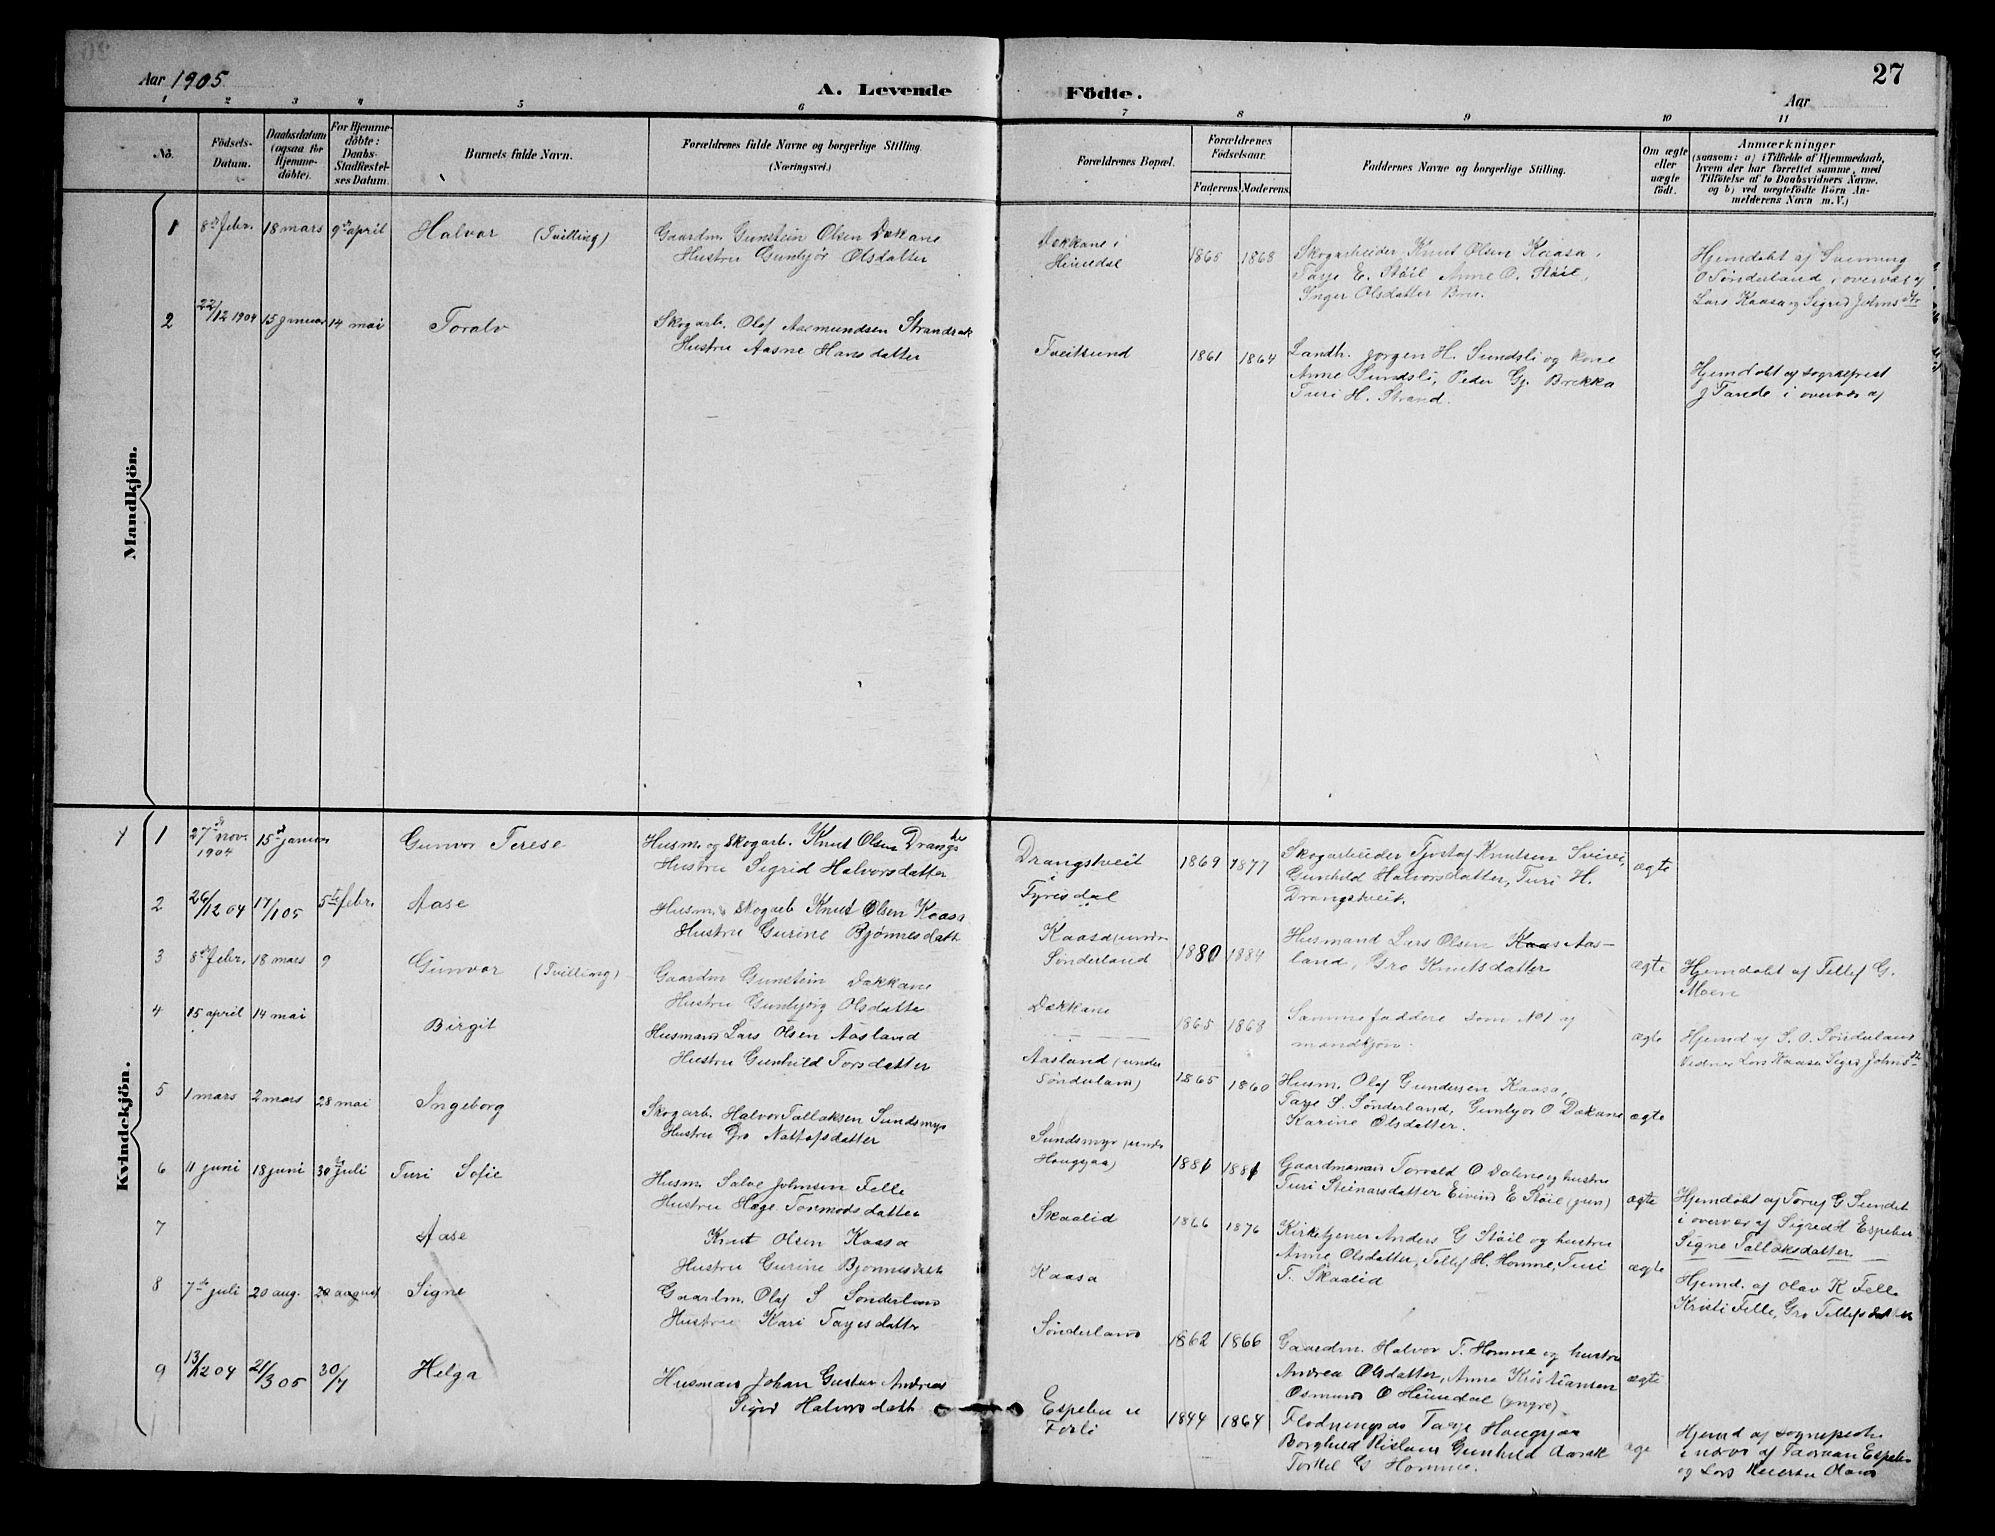 SAKO, Nissedal kirkebøker, G/Gb/L0003: Klokkerbok nr. II 3, 1893-1928, s. 27